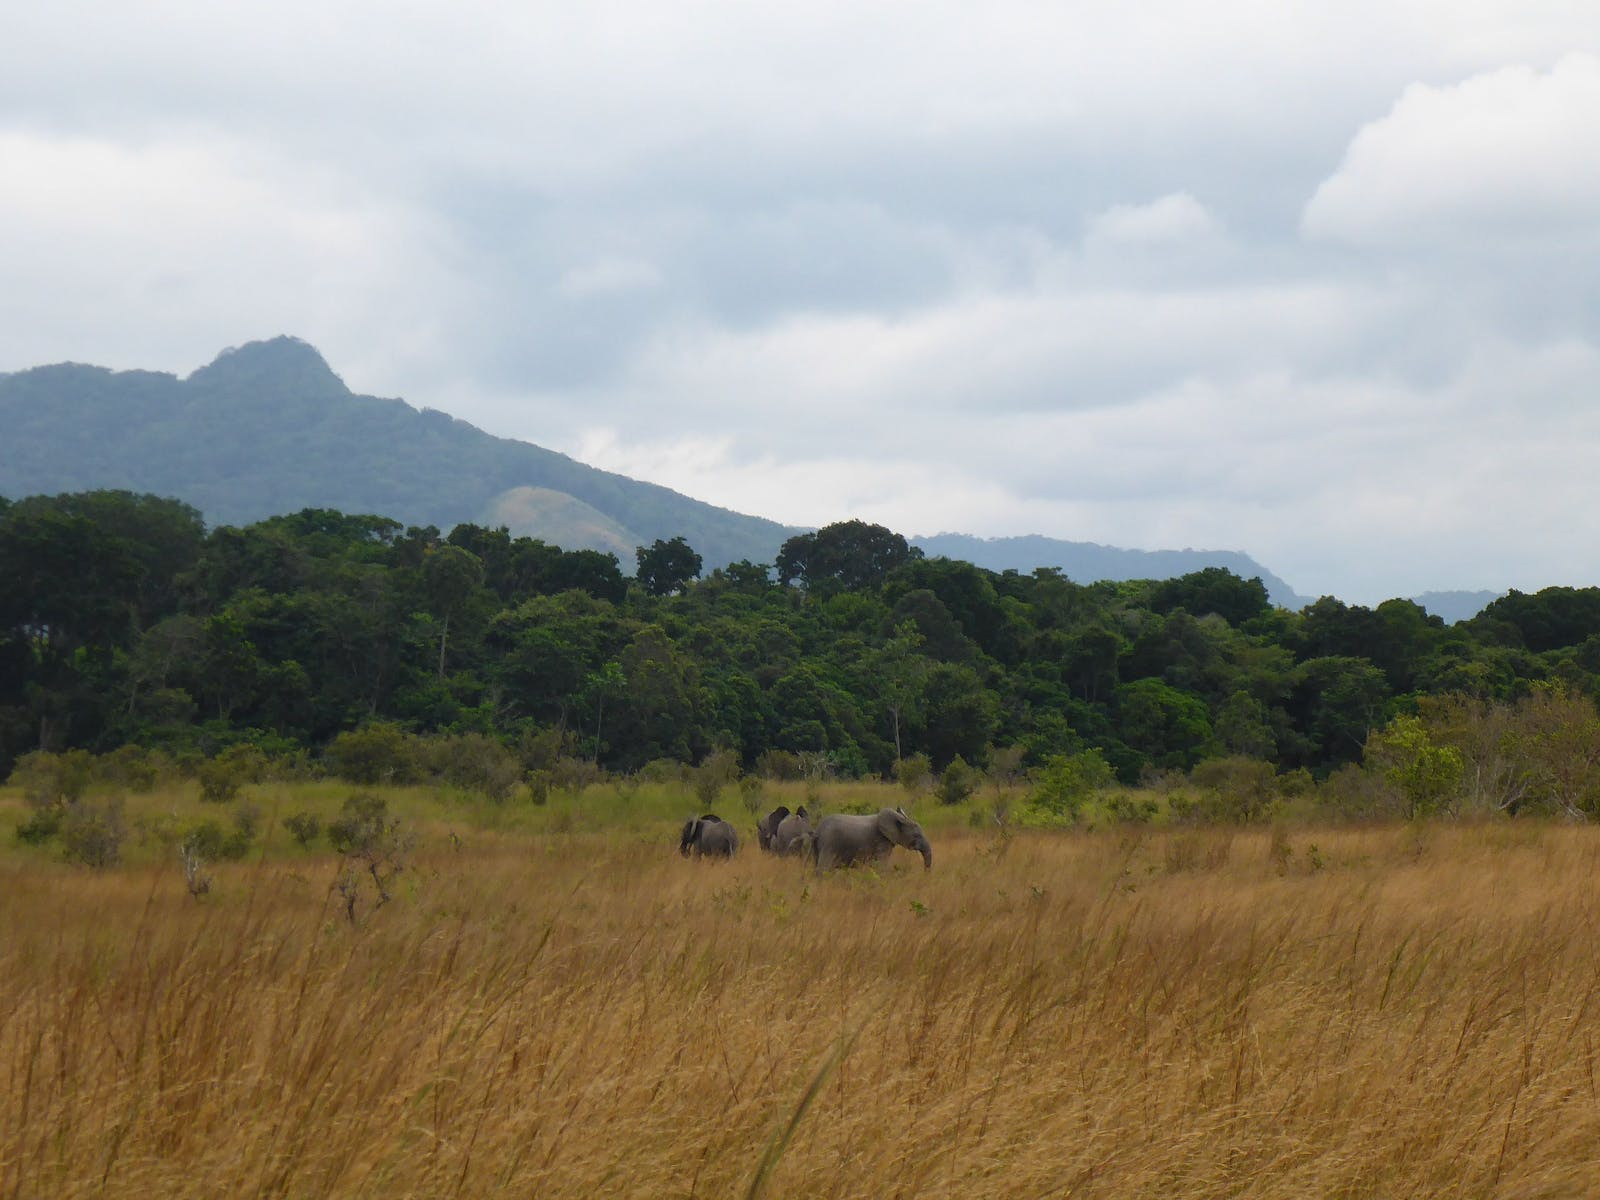 Western Congolian Forest-Savanna